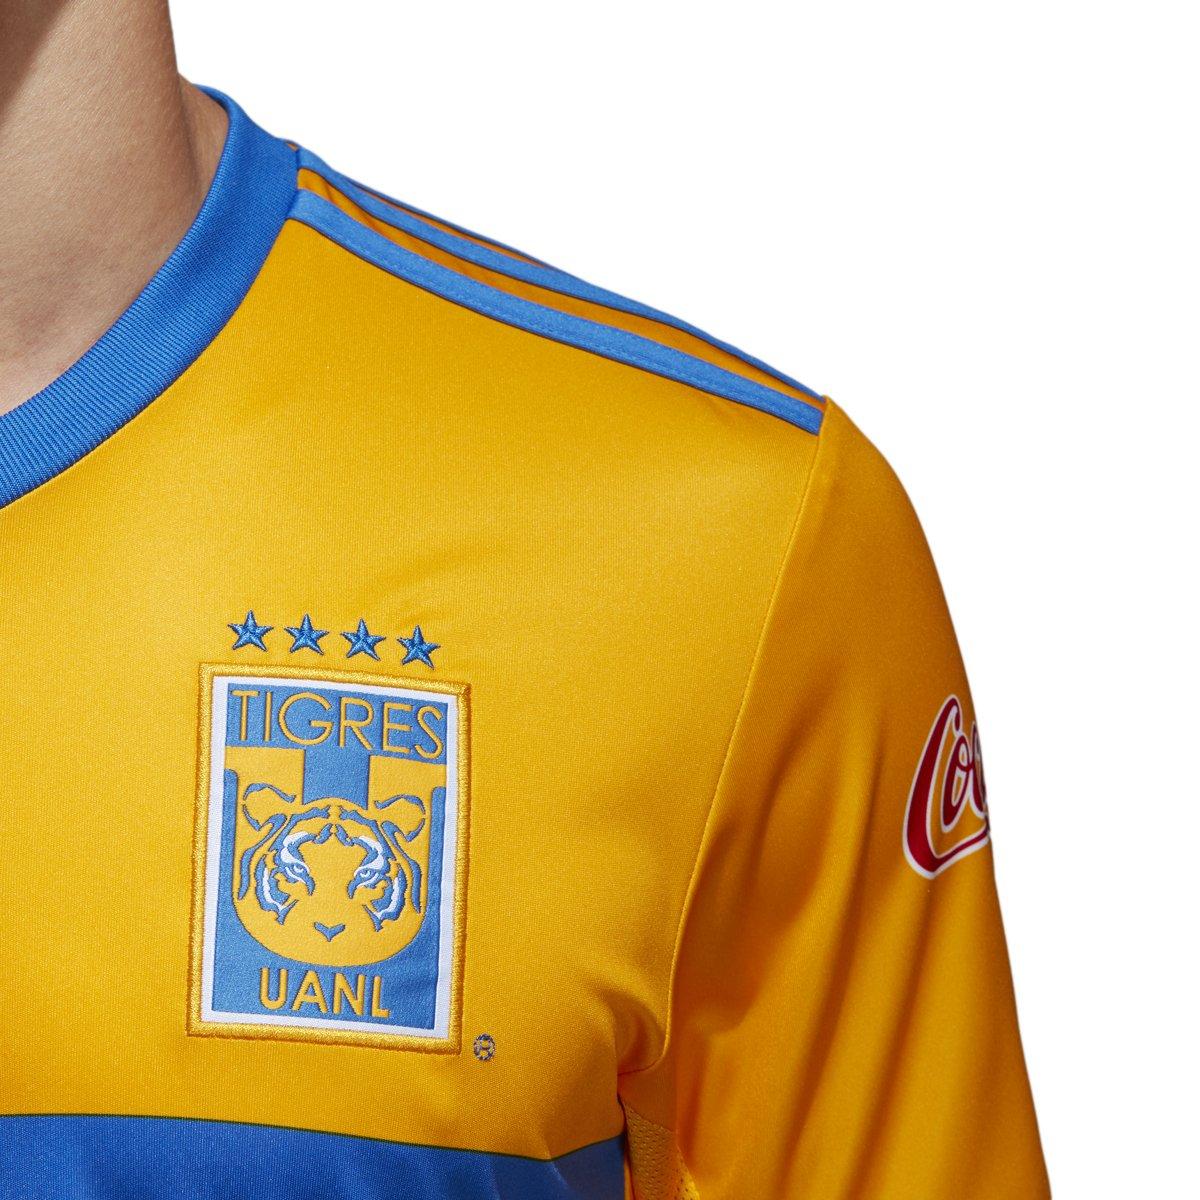 688f20d664d Amazon.com  adidas Men s Soccer Tigres UANL Home Jersey  Clothing